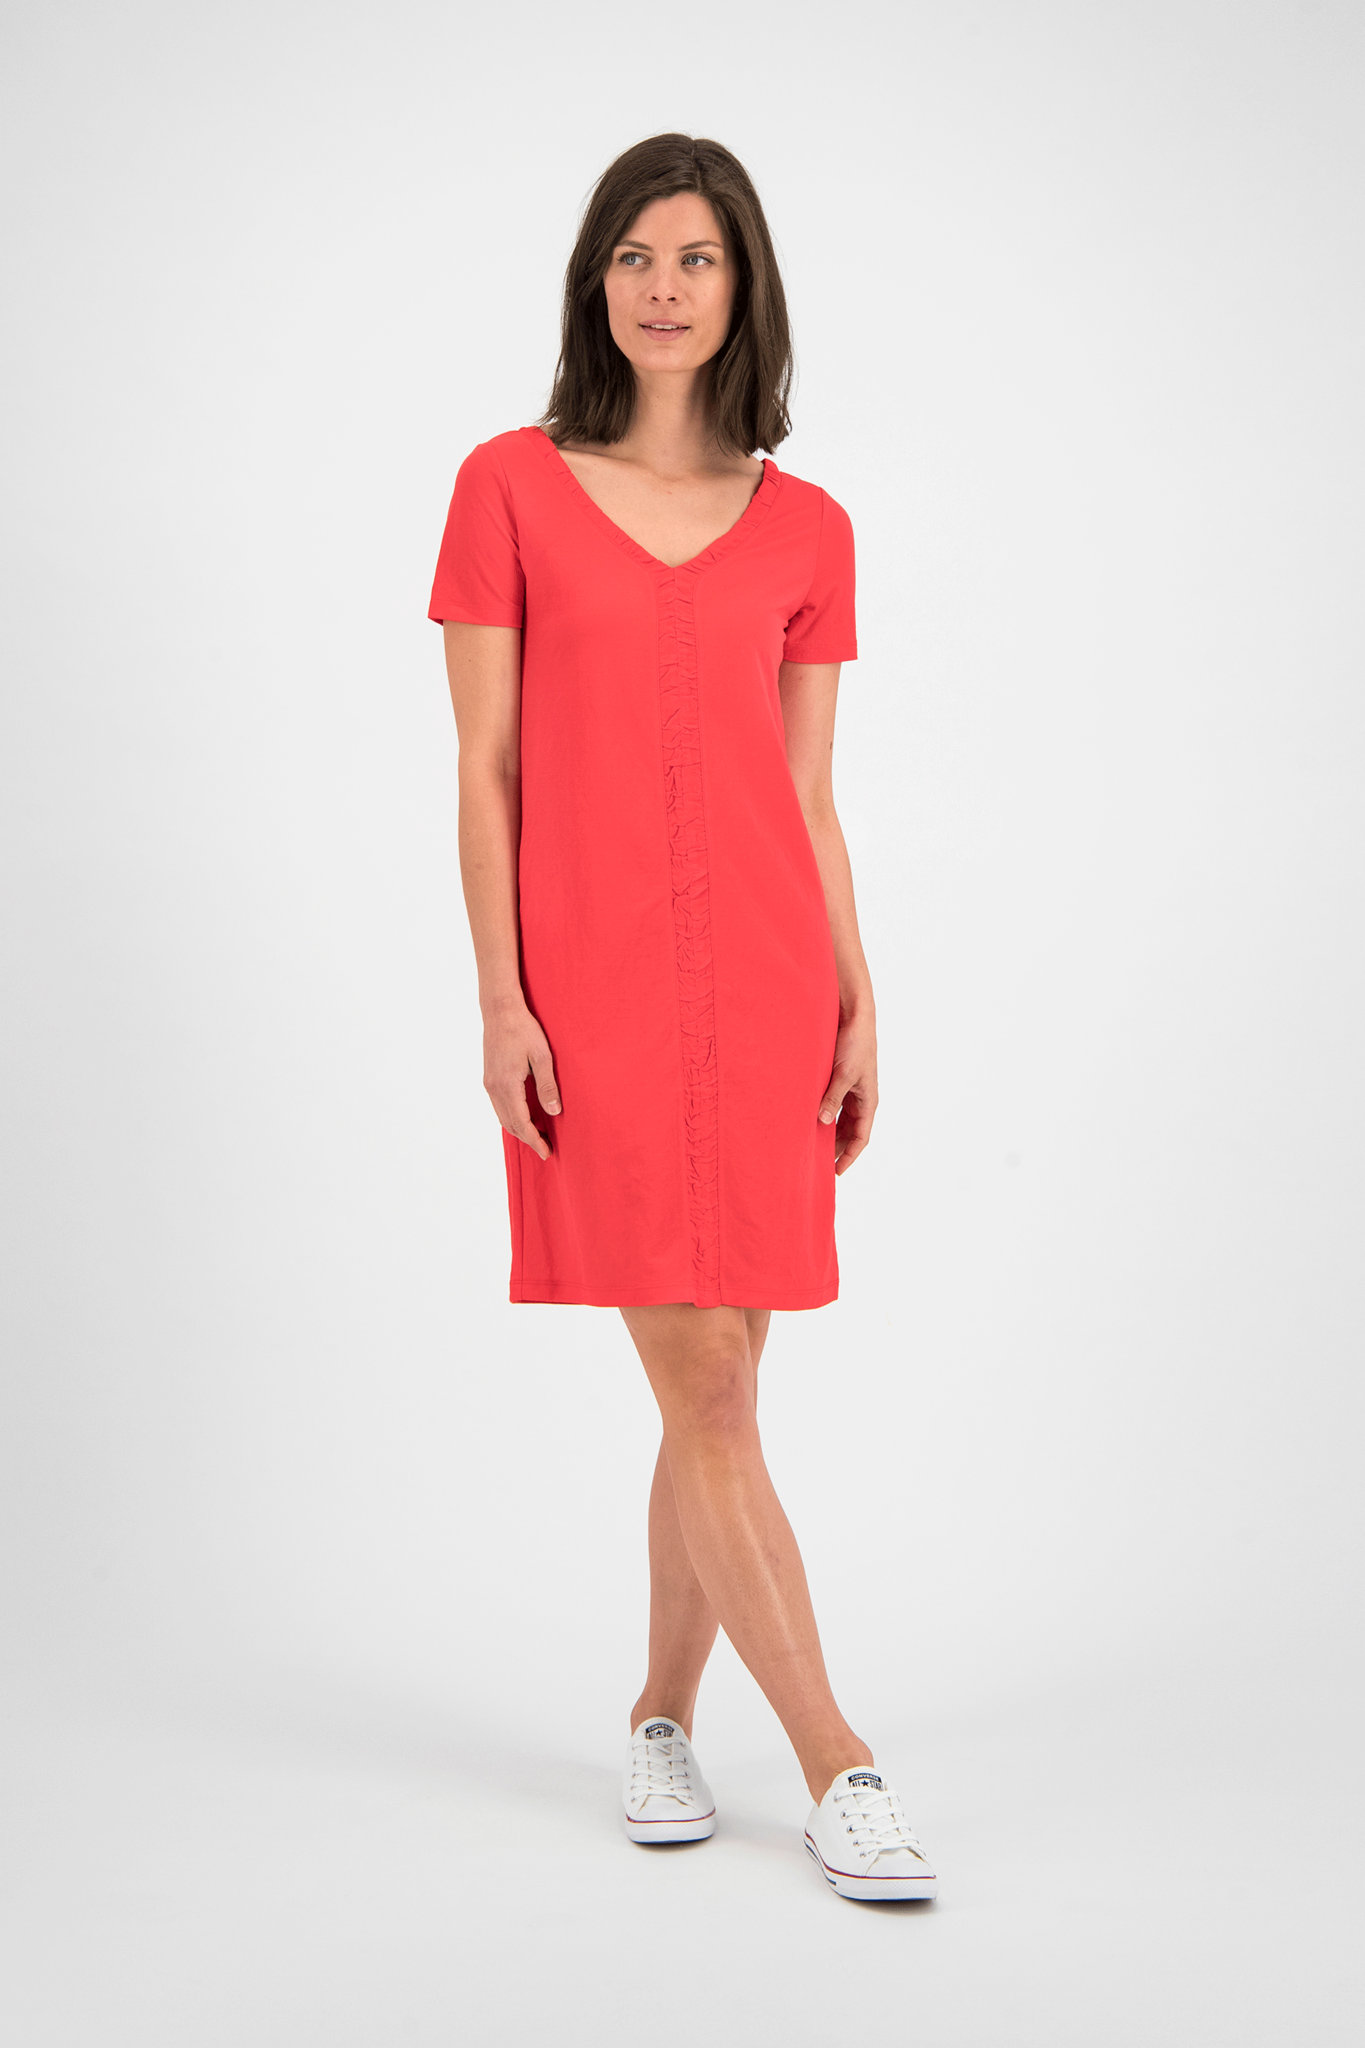 SYLVER Crêpe Stretch Dress Ruffle - Coral